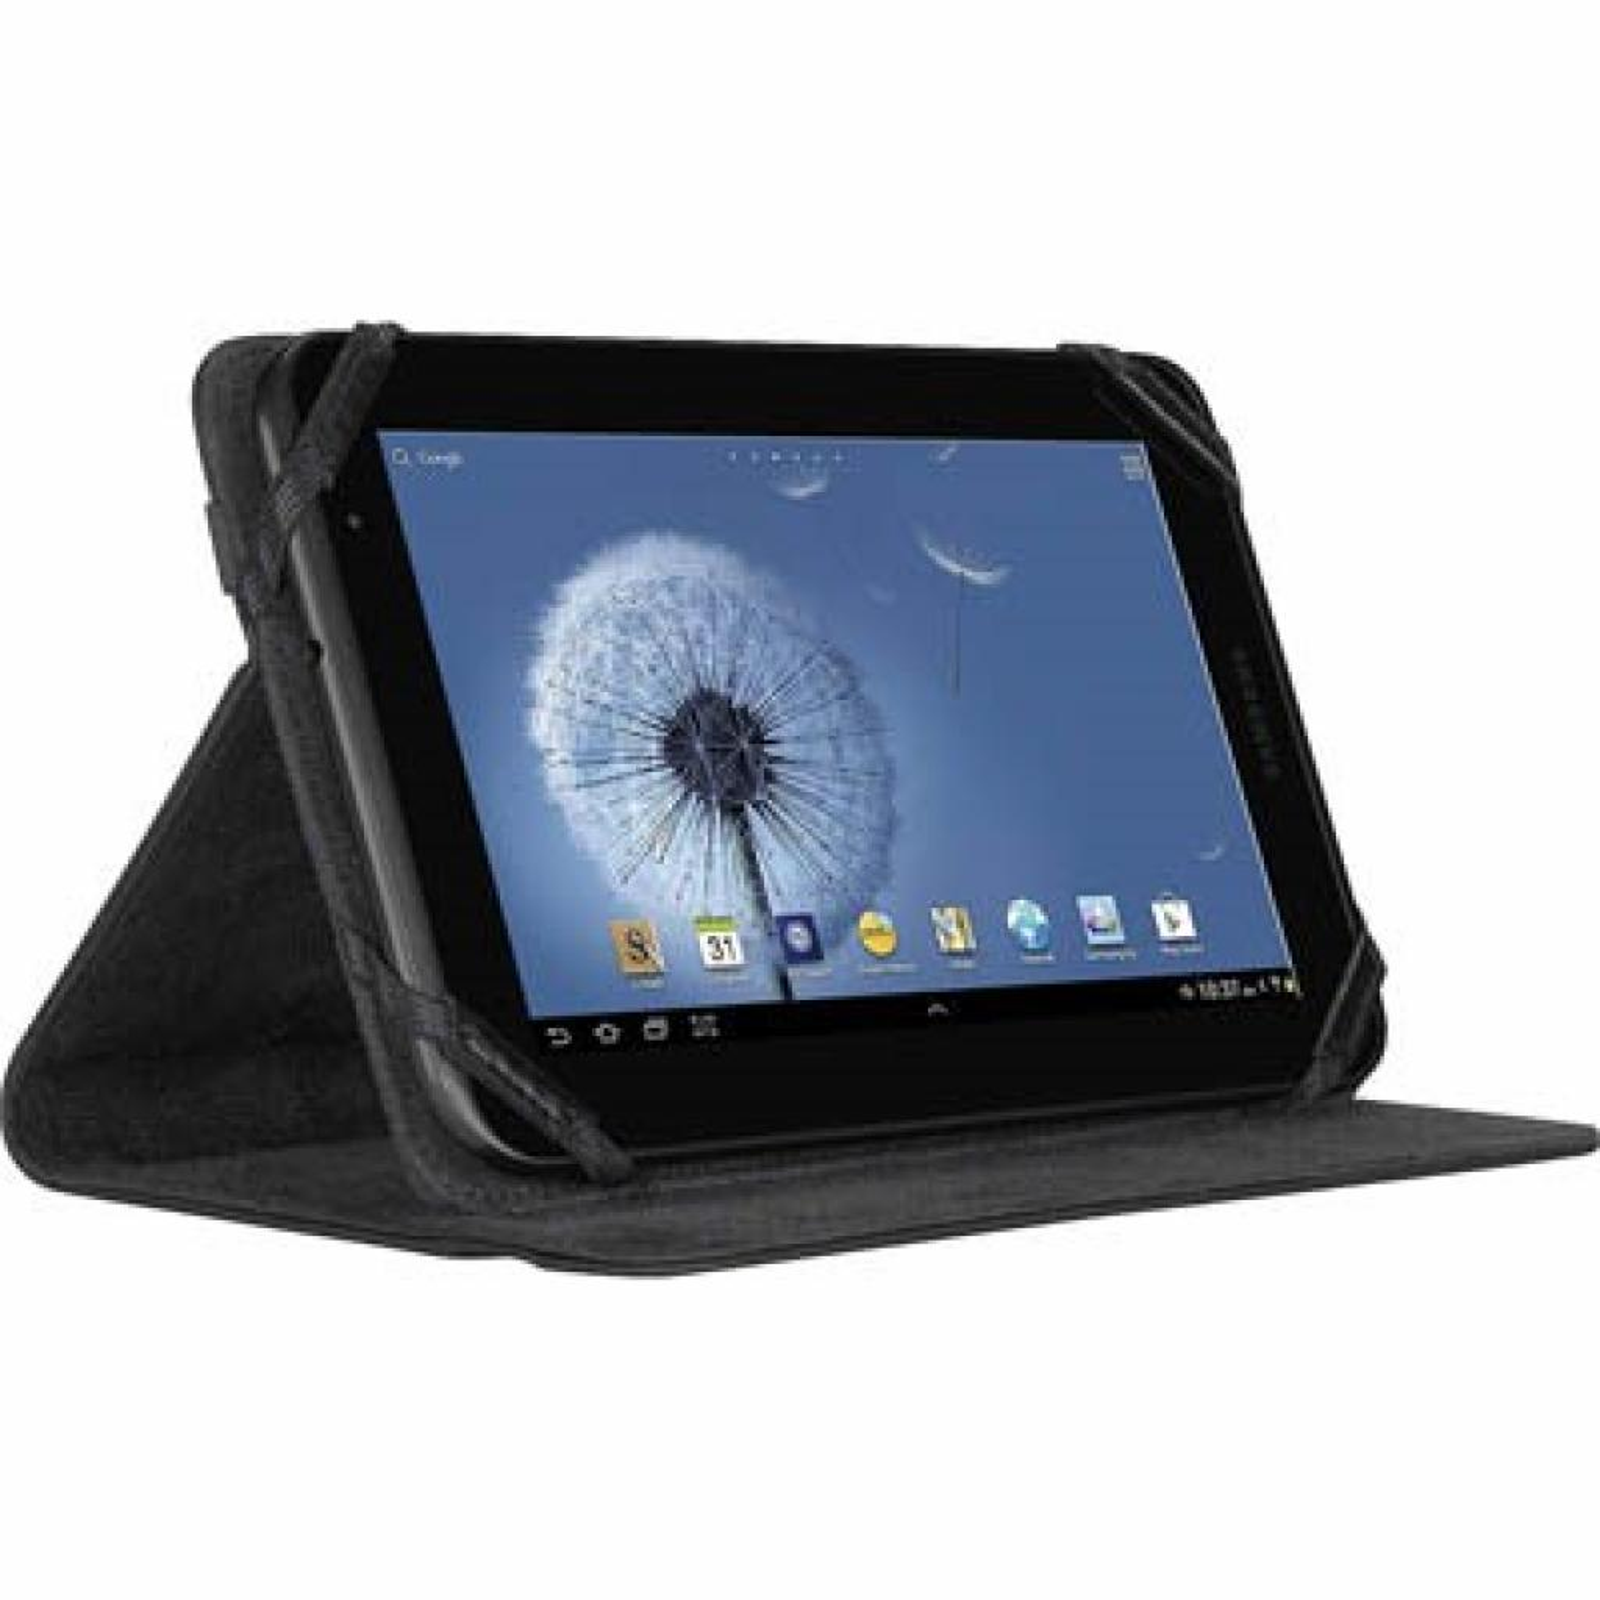 Чехол для планшета Targus 7 Galaxy Tab/Tab2/Tab3 Kickstand Protective Folio (THZ206EU) изображение 2